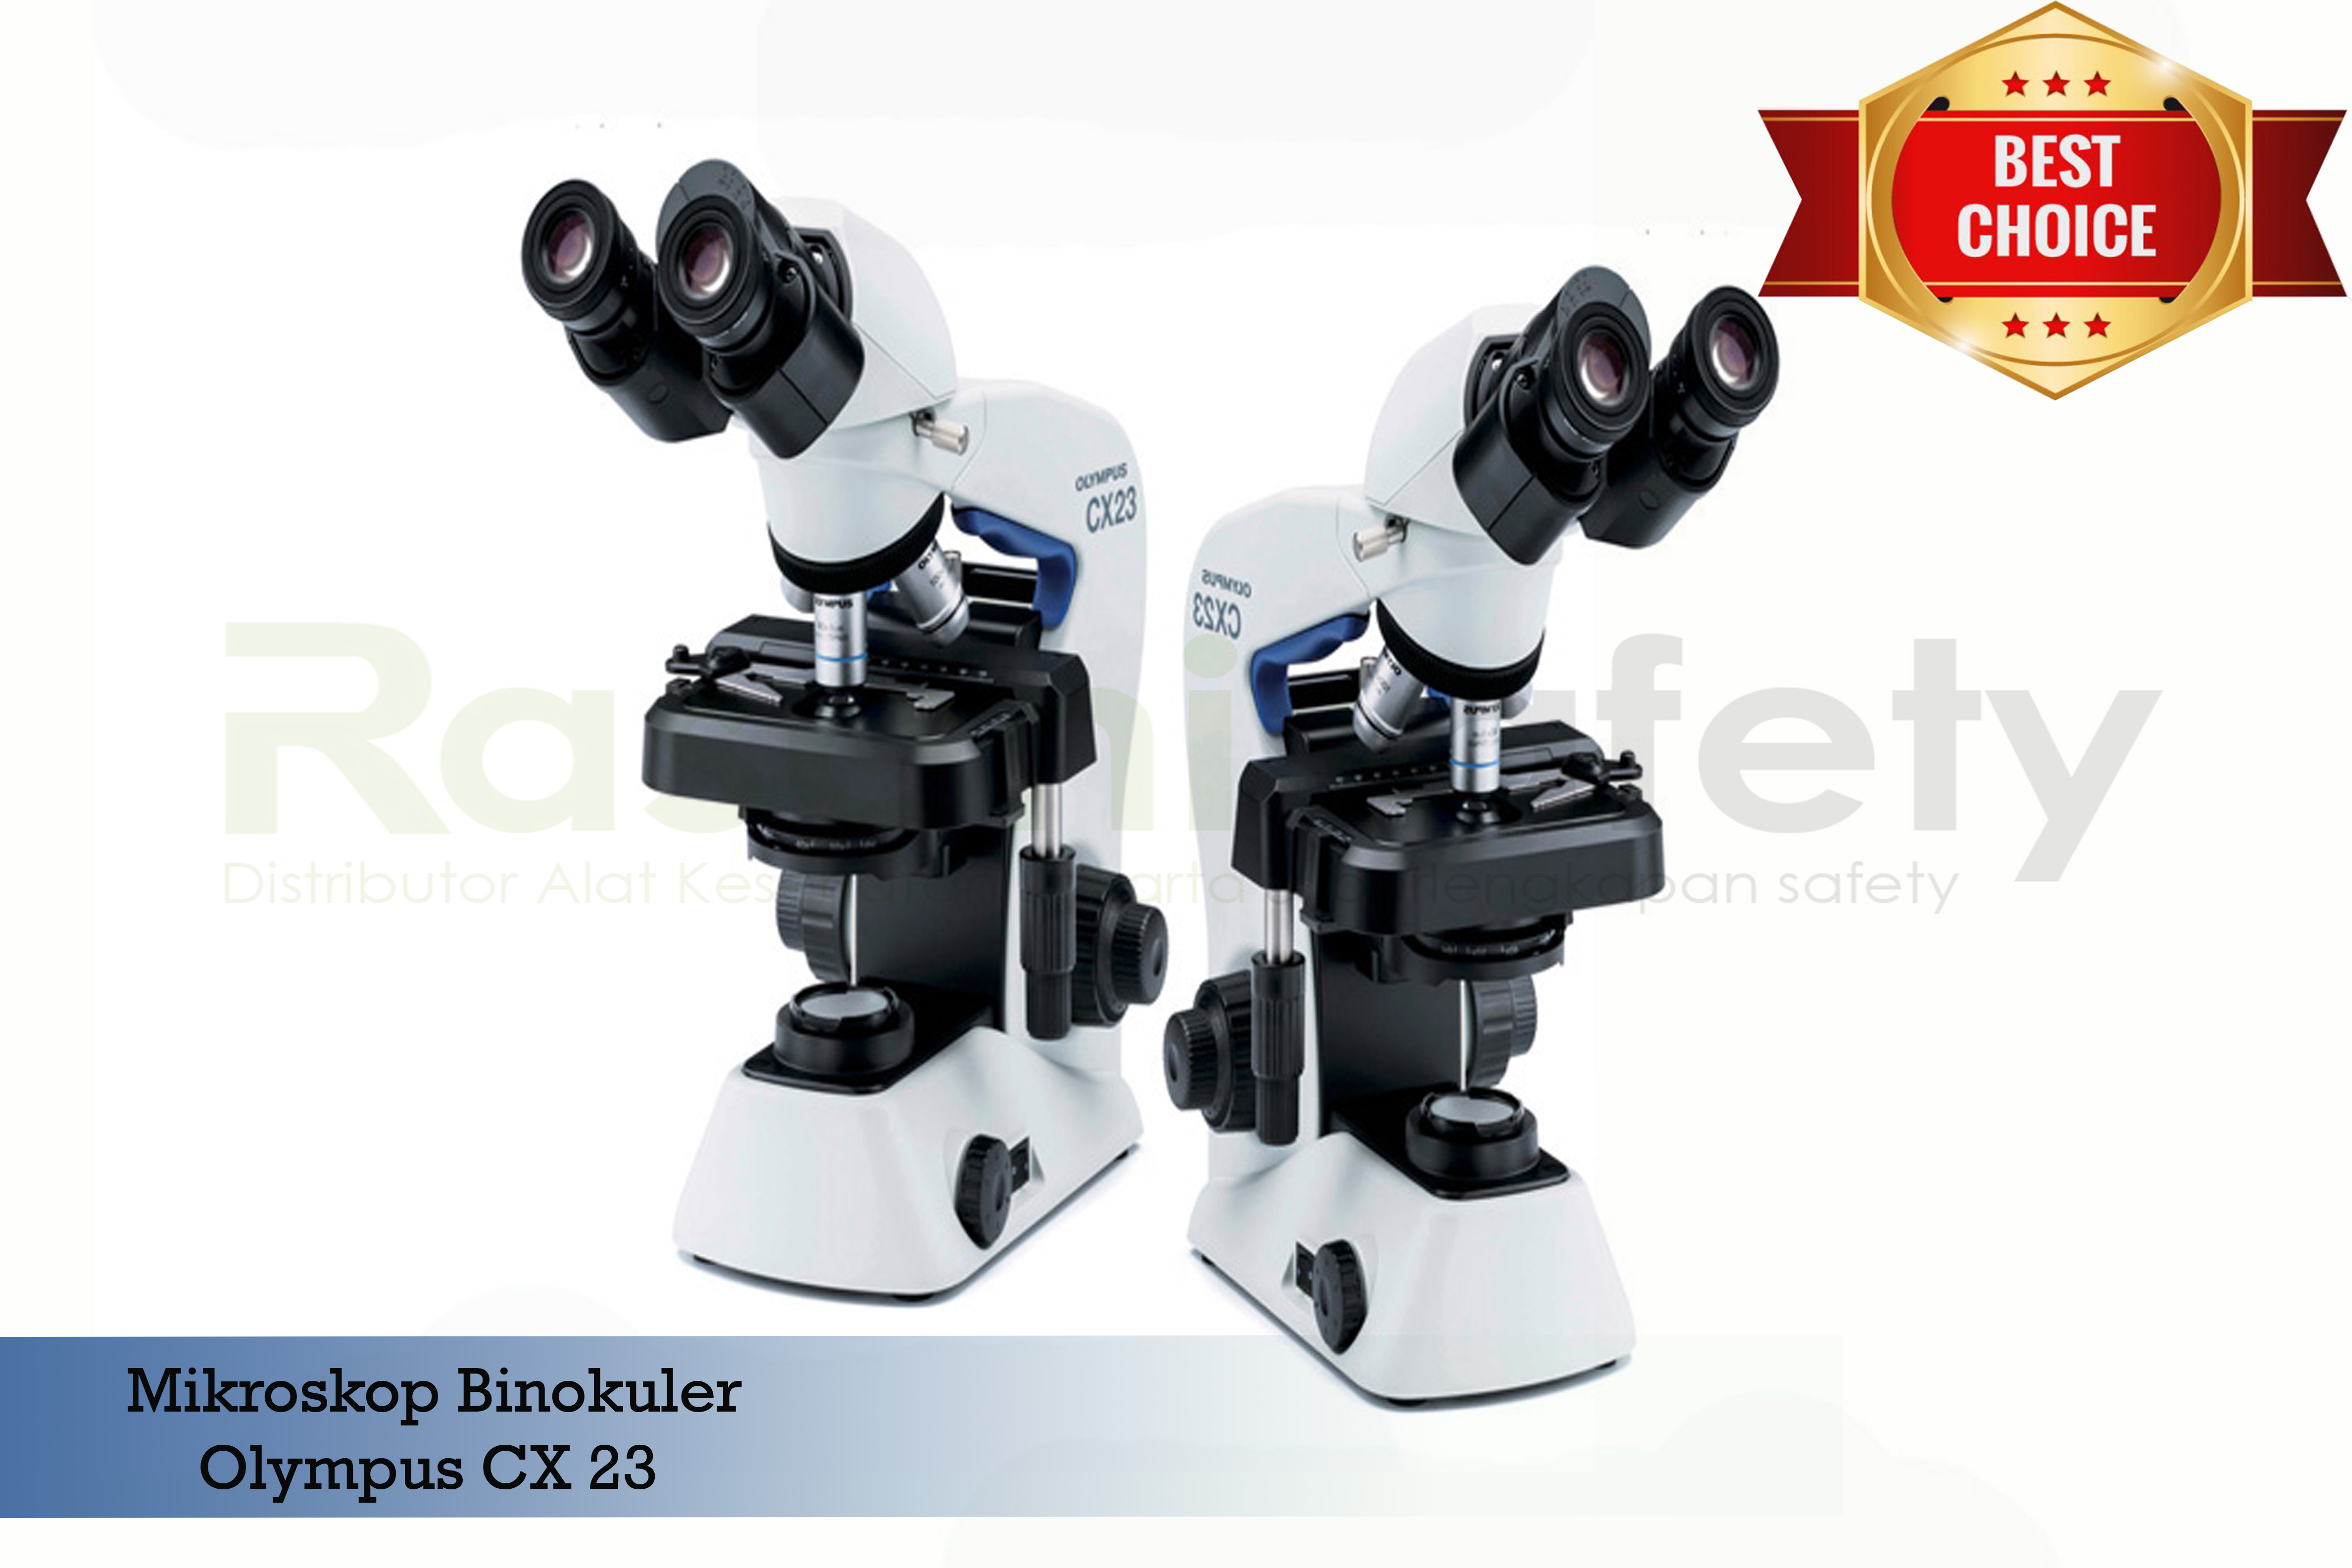 Mikroskop Profesional Murah   Rasani Safety